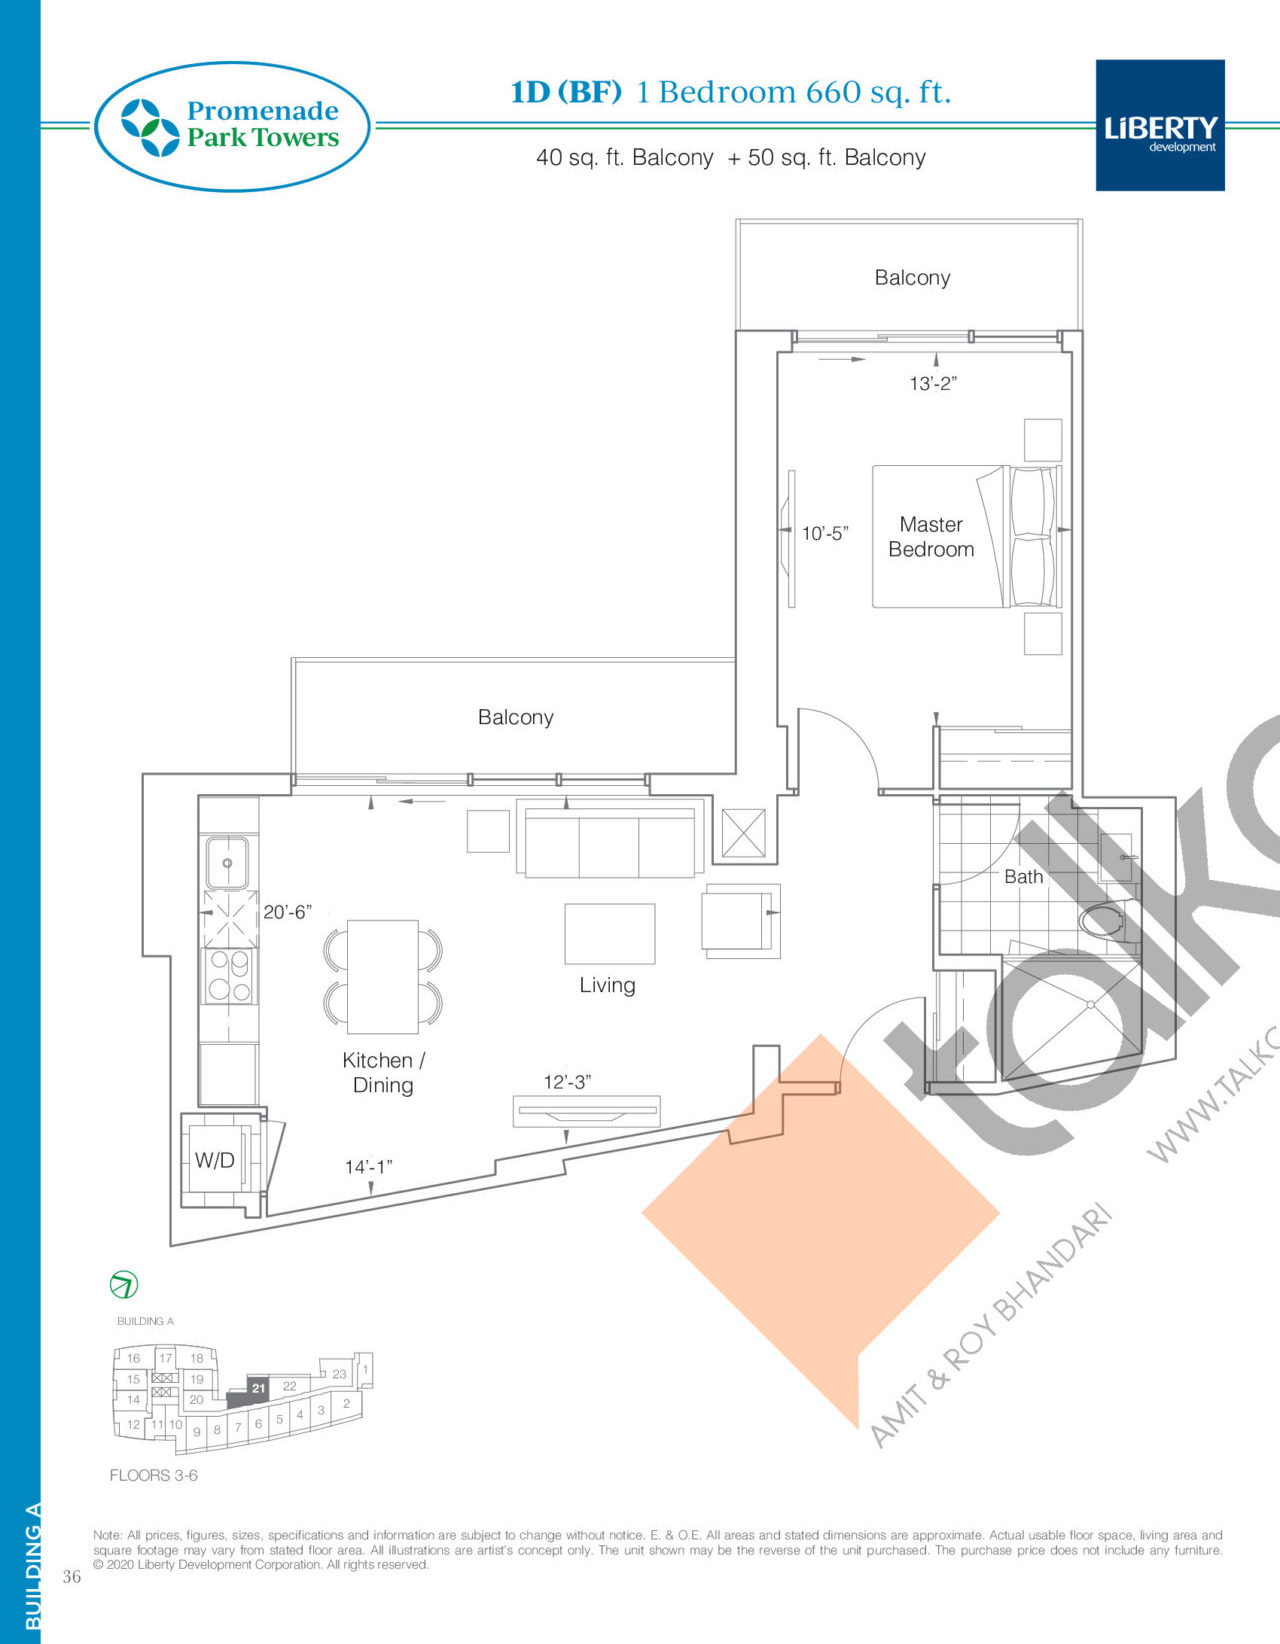 1D (BF) Floor Plan at Promenade Park Towers Phase 2 Condos - 660 sq.ft